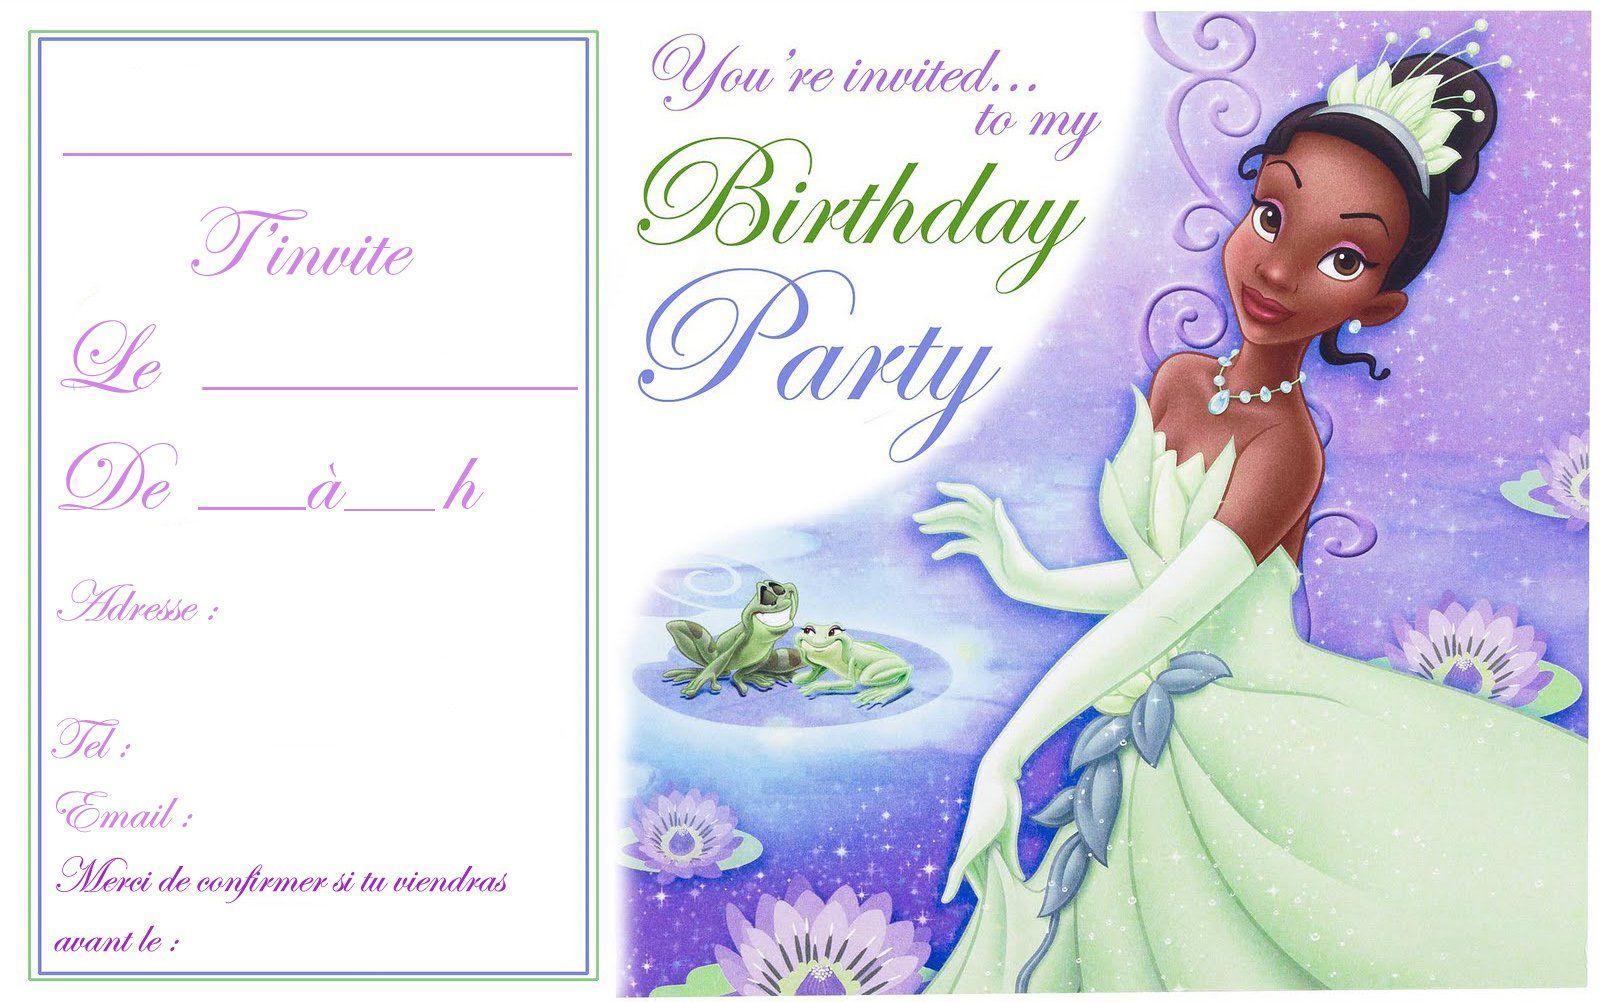 Carte invitation anniversaire fille carte d invitation anniversaire fille carte anniversaire - Carte invitation anniversaire monstre ...